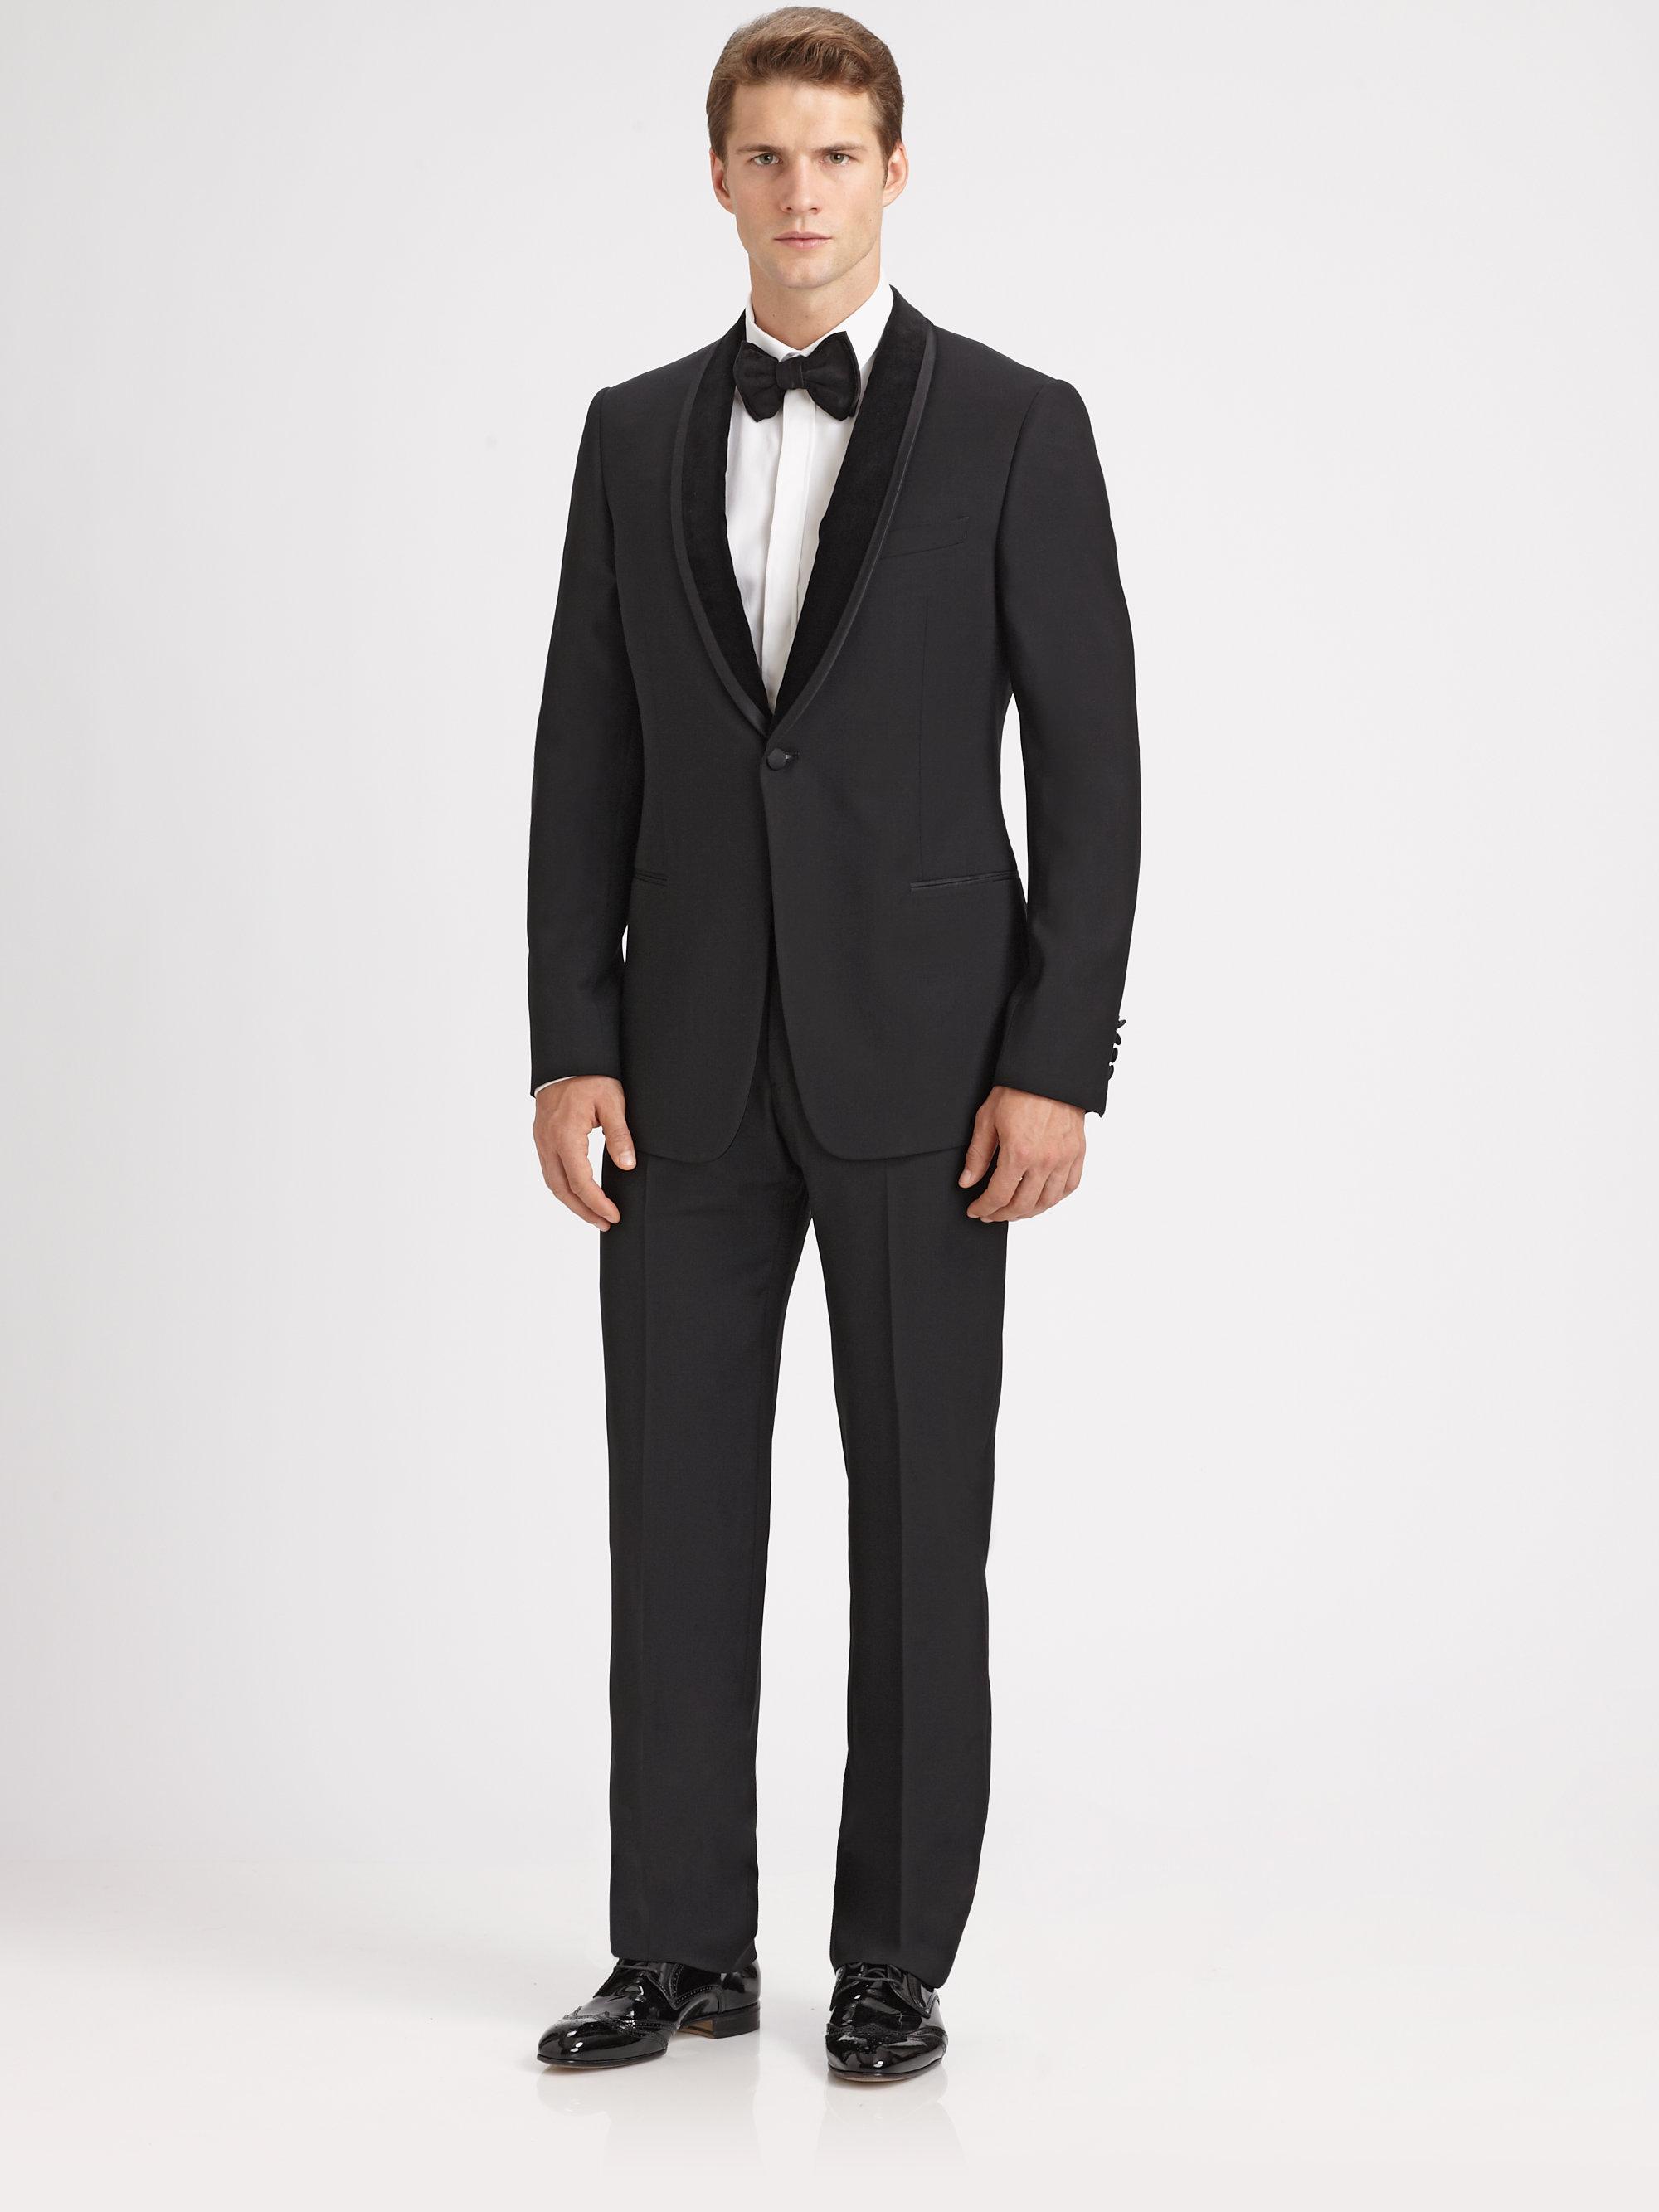 Armani Shawl Collar Tuxedo in Black for Men | Lyst Giorgio Armani Jacket